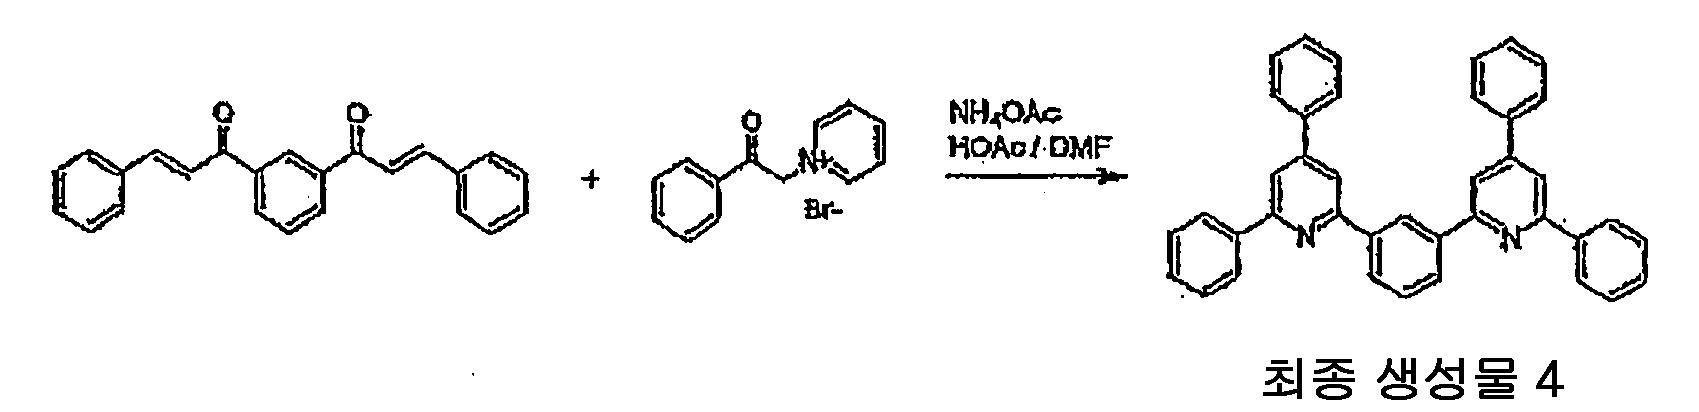 Figure 112010002231902-pat00097